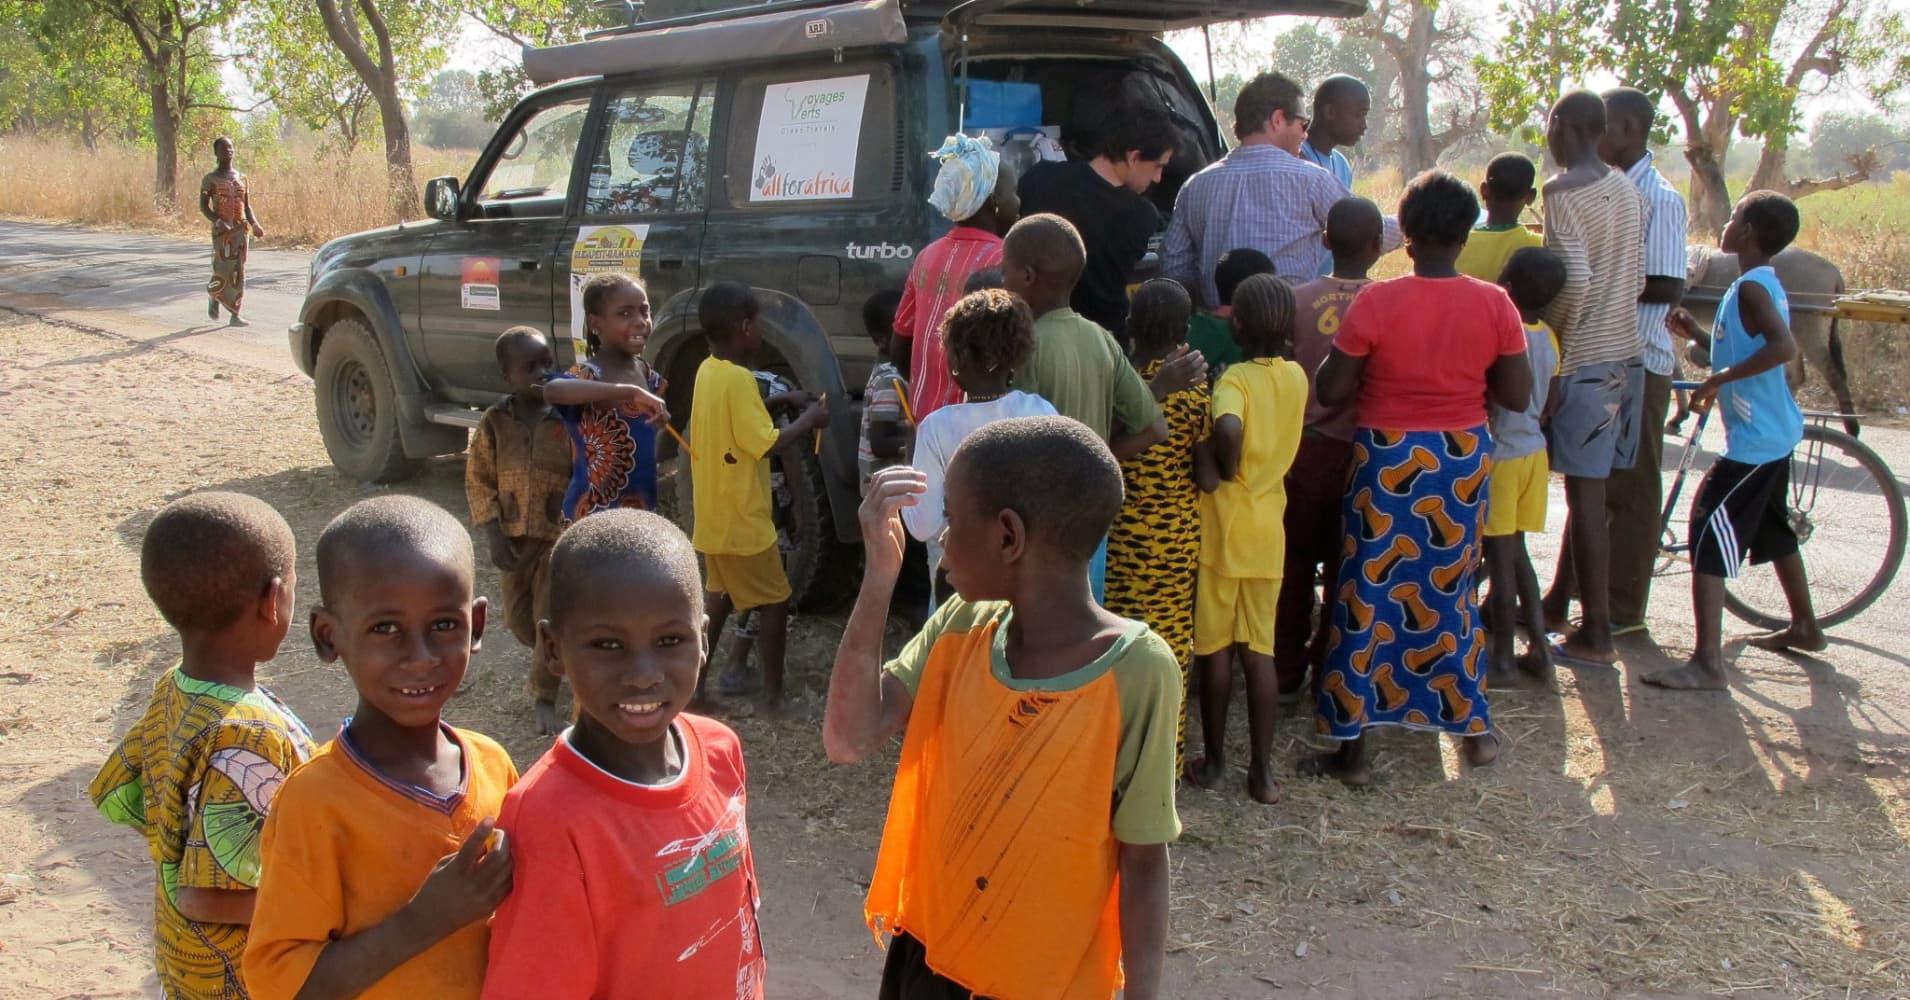 Educators look to boost charter school model in Africa, beyond